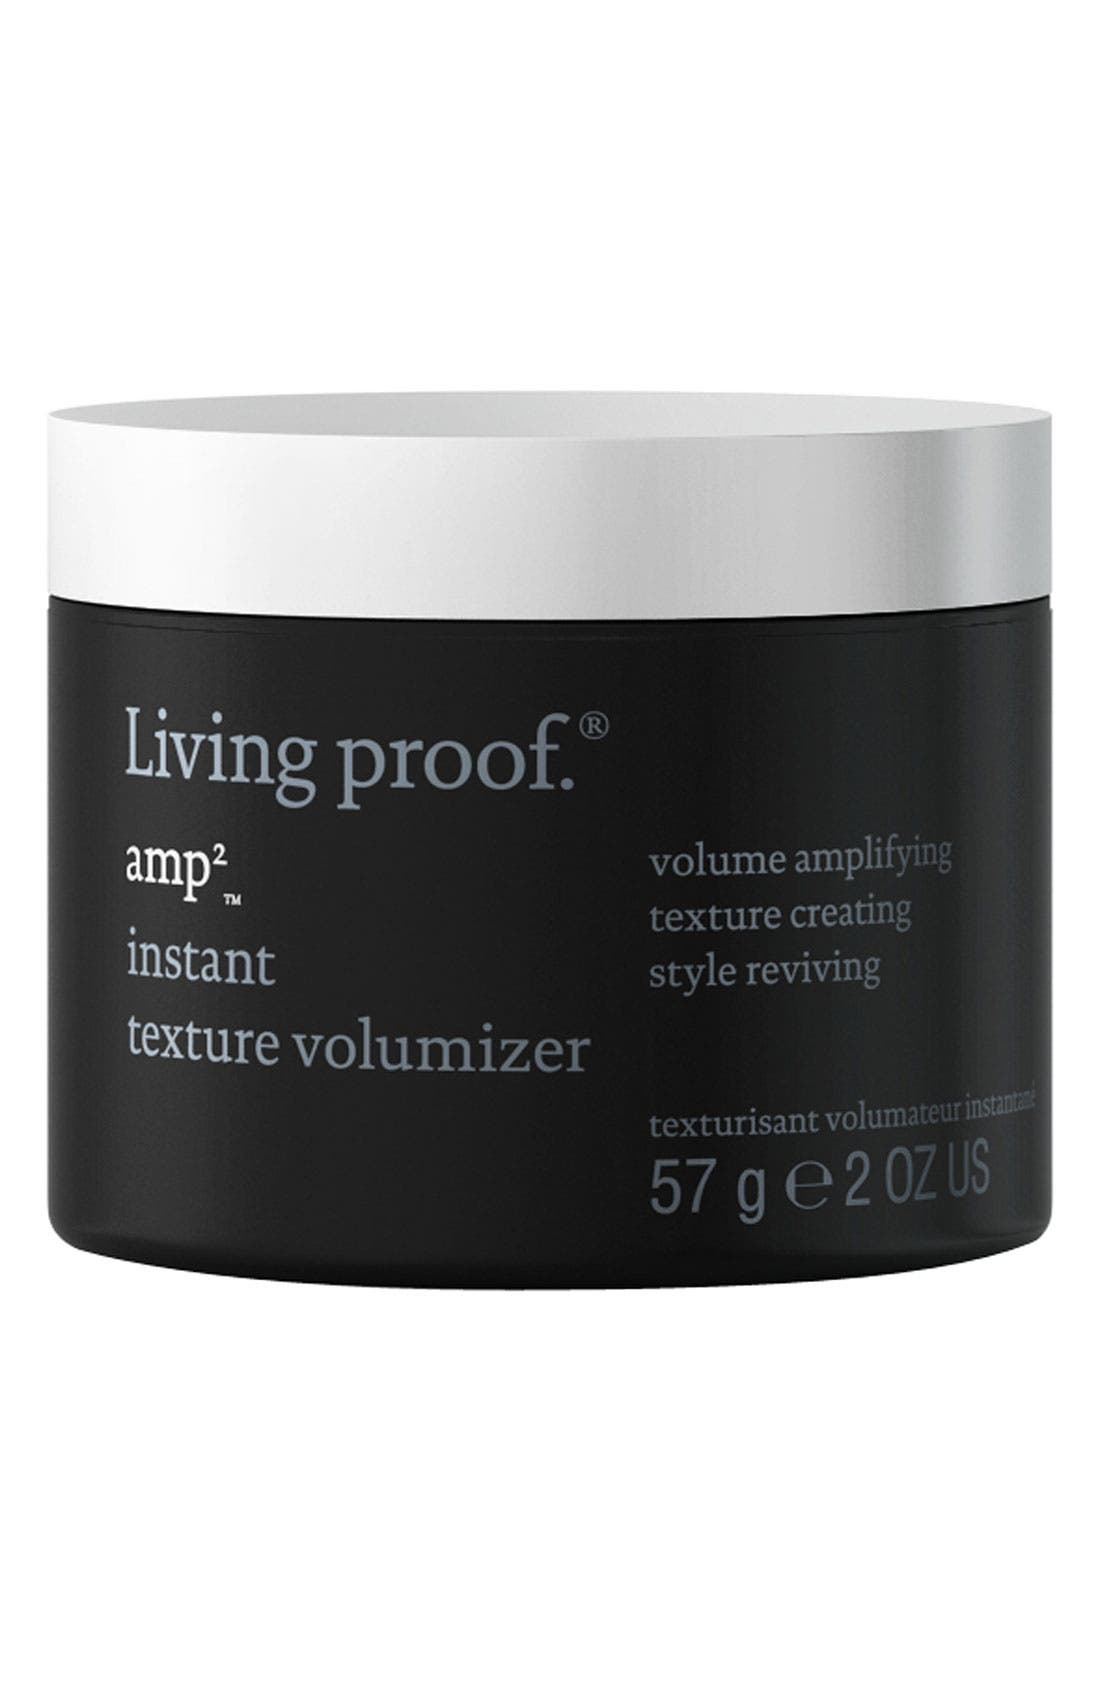 Living proof® amp² Instant Texture Volumizer